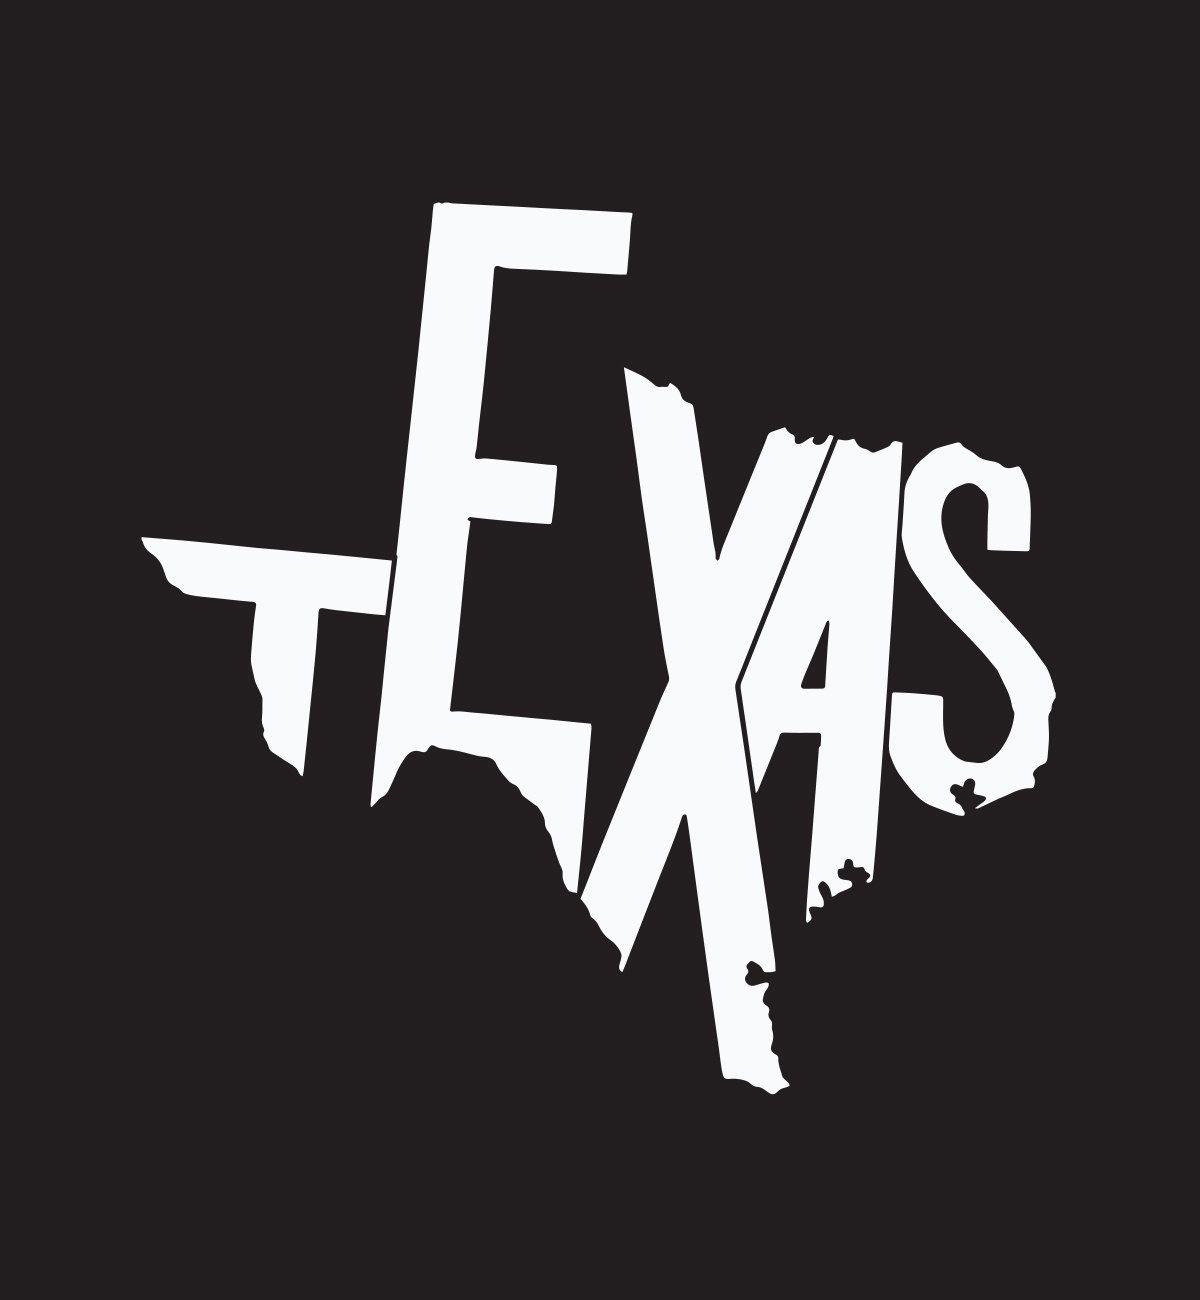 Texas state window decal stately decals from the stately shirt co texas window decal sticker dallas austin san antonio houston 3 99 usd